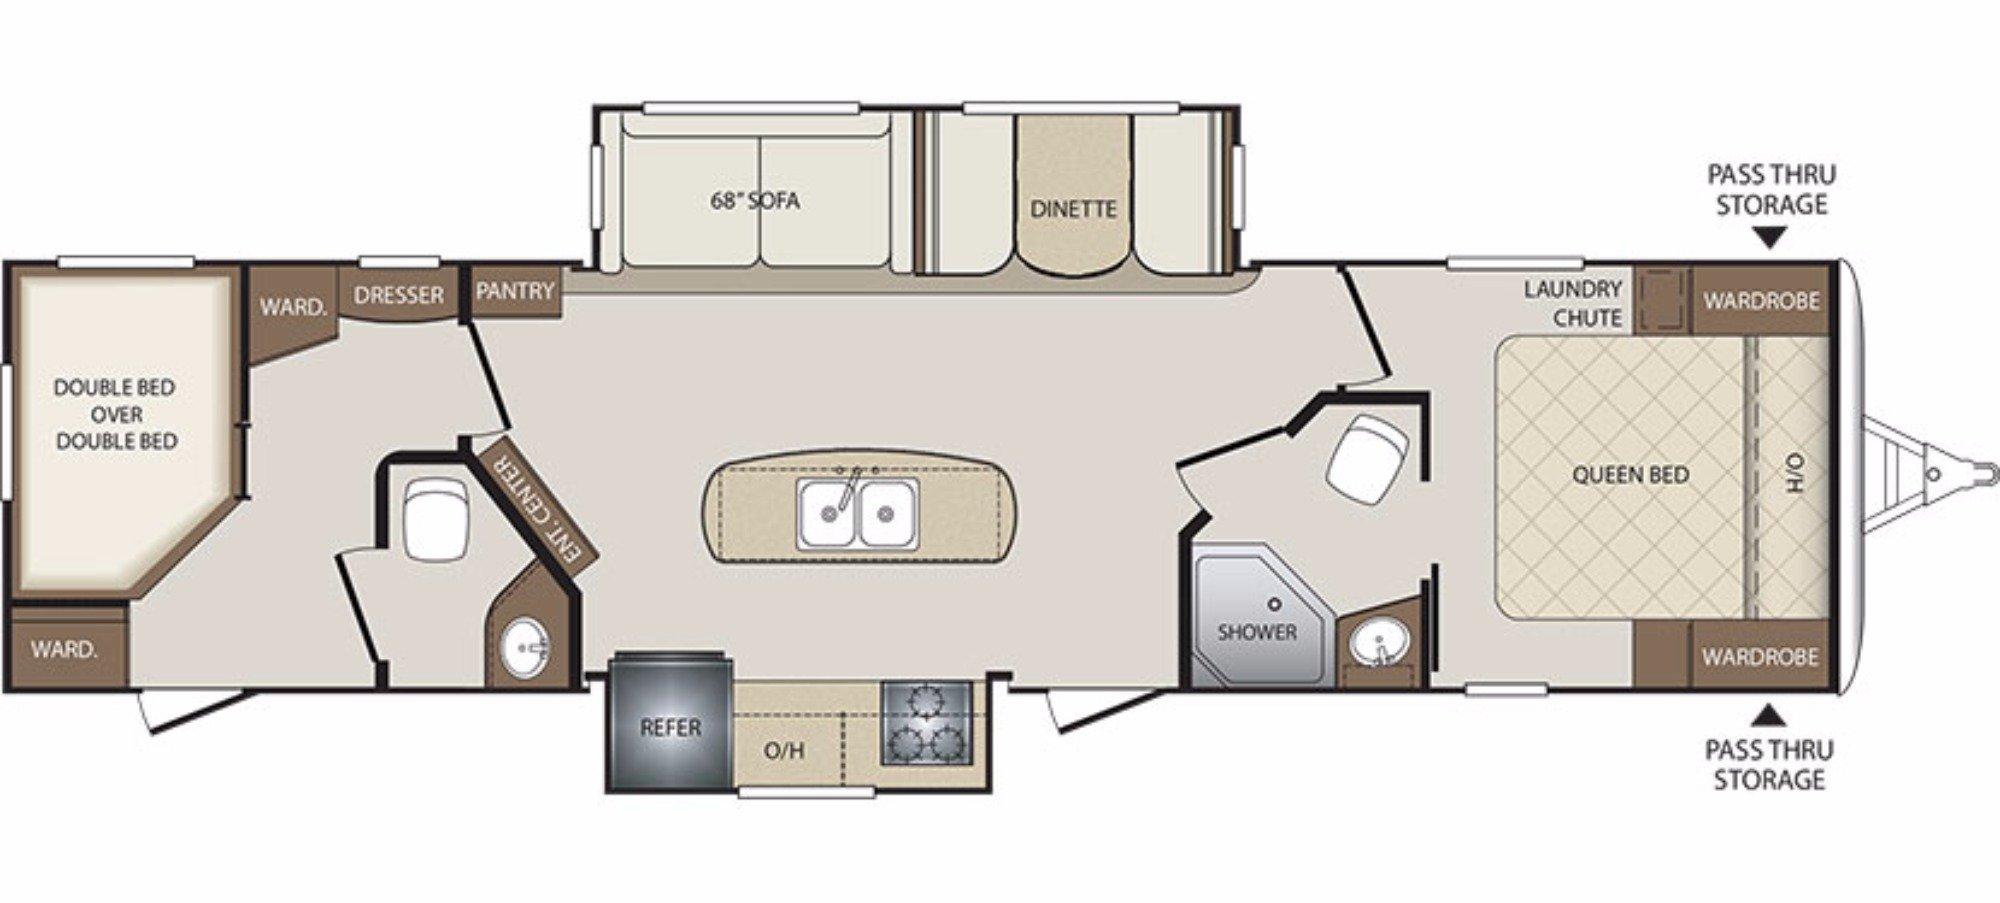 View Floor Plan for 2018 KEYSTONE BULLET 330BHS